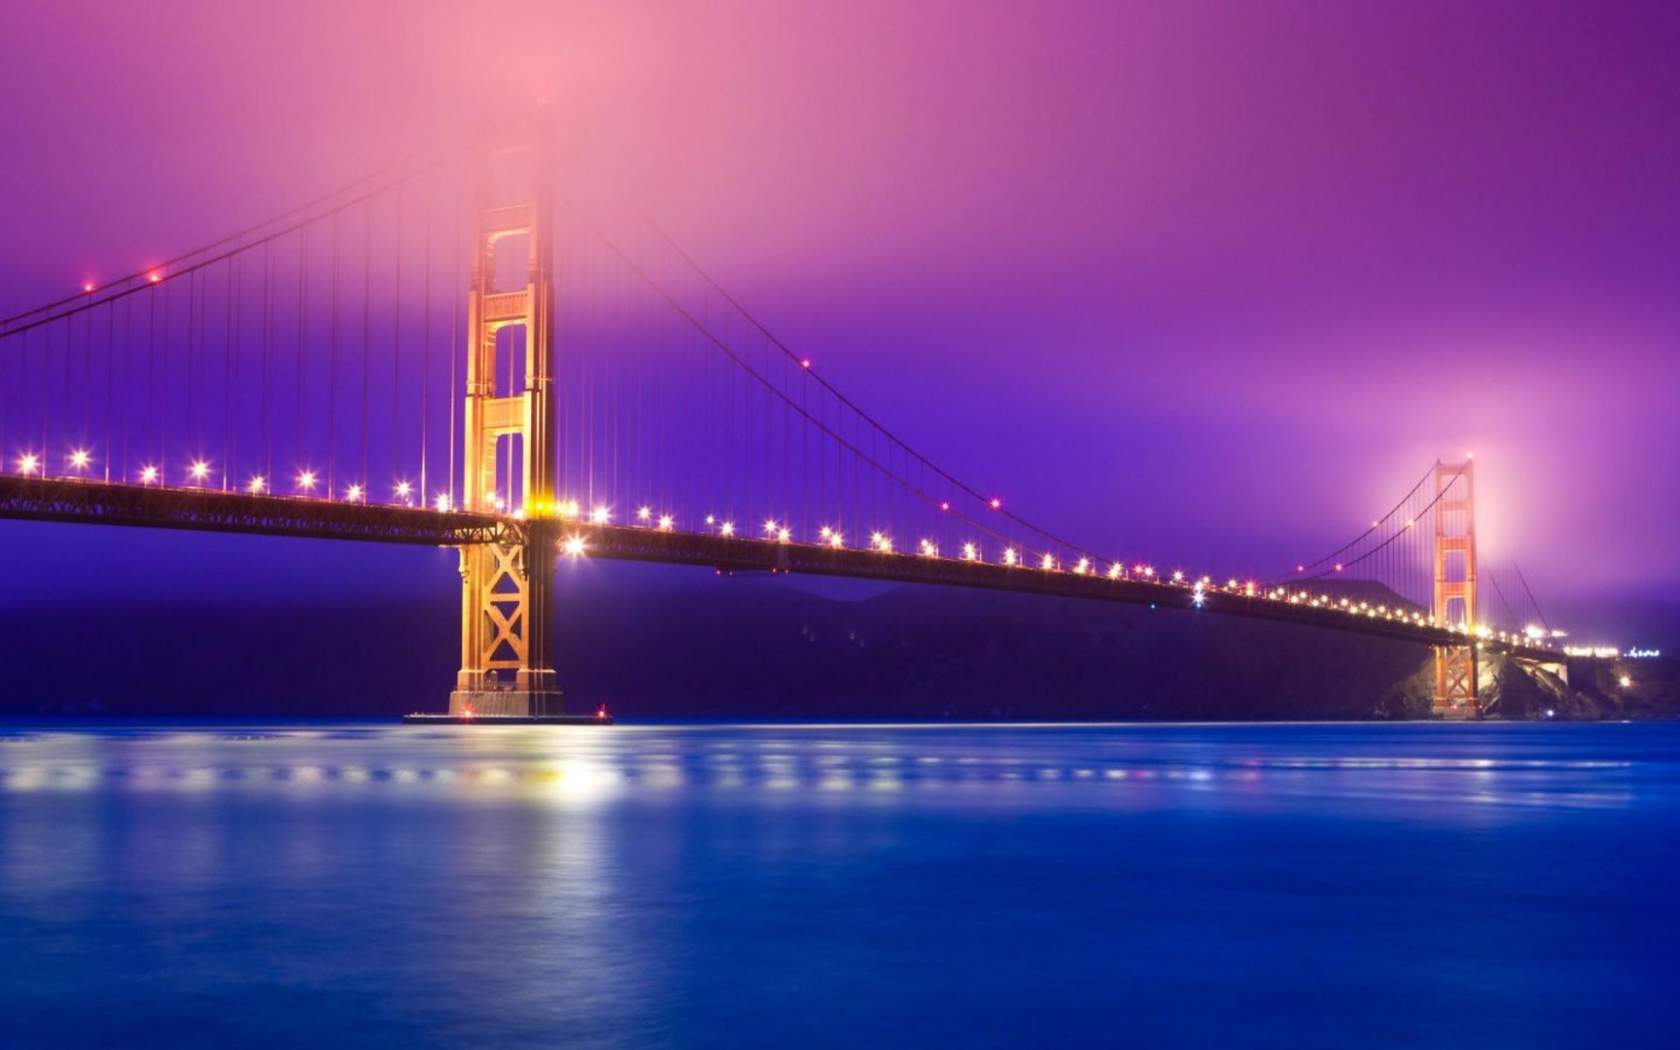 Free Download Golden Gate Bridge City Travel Wallpaper Hd 1080p